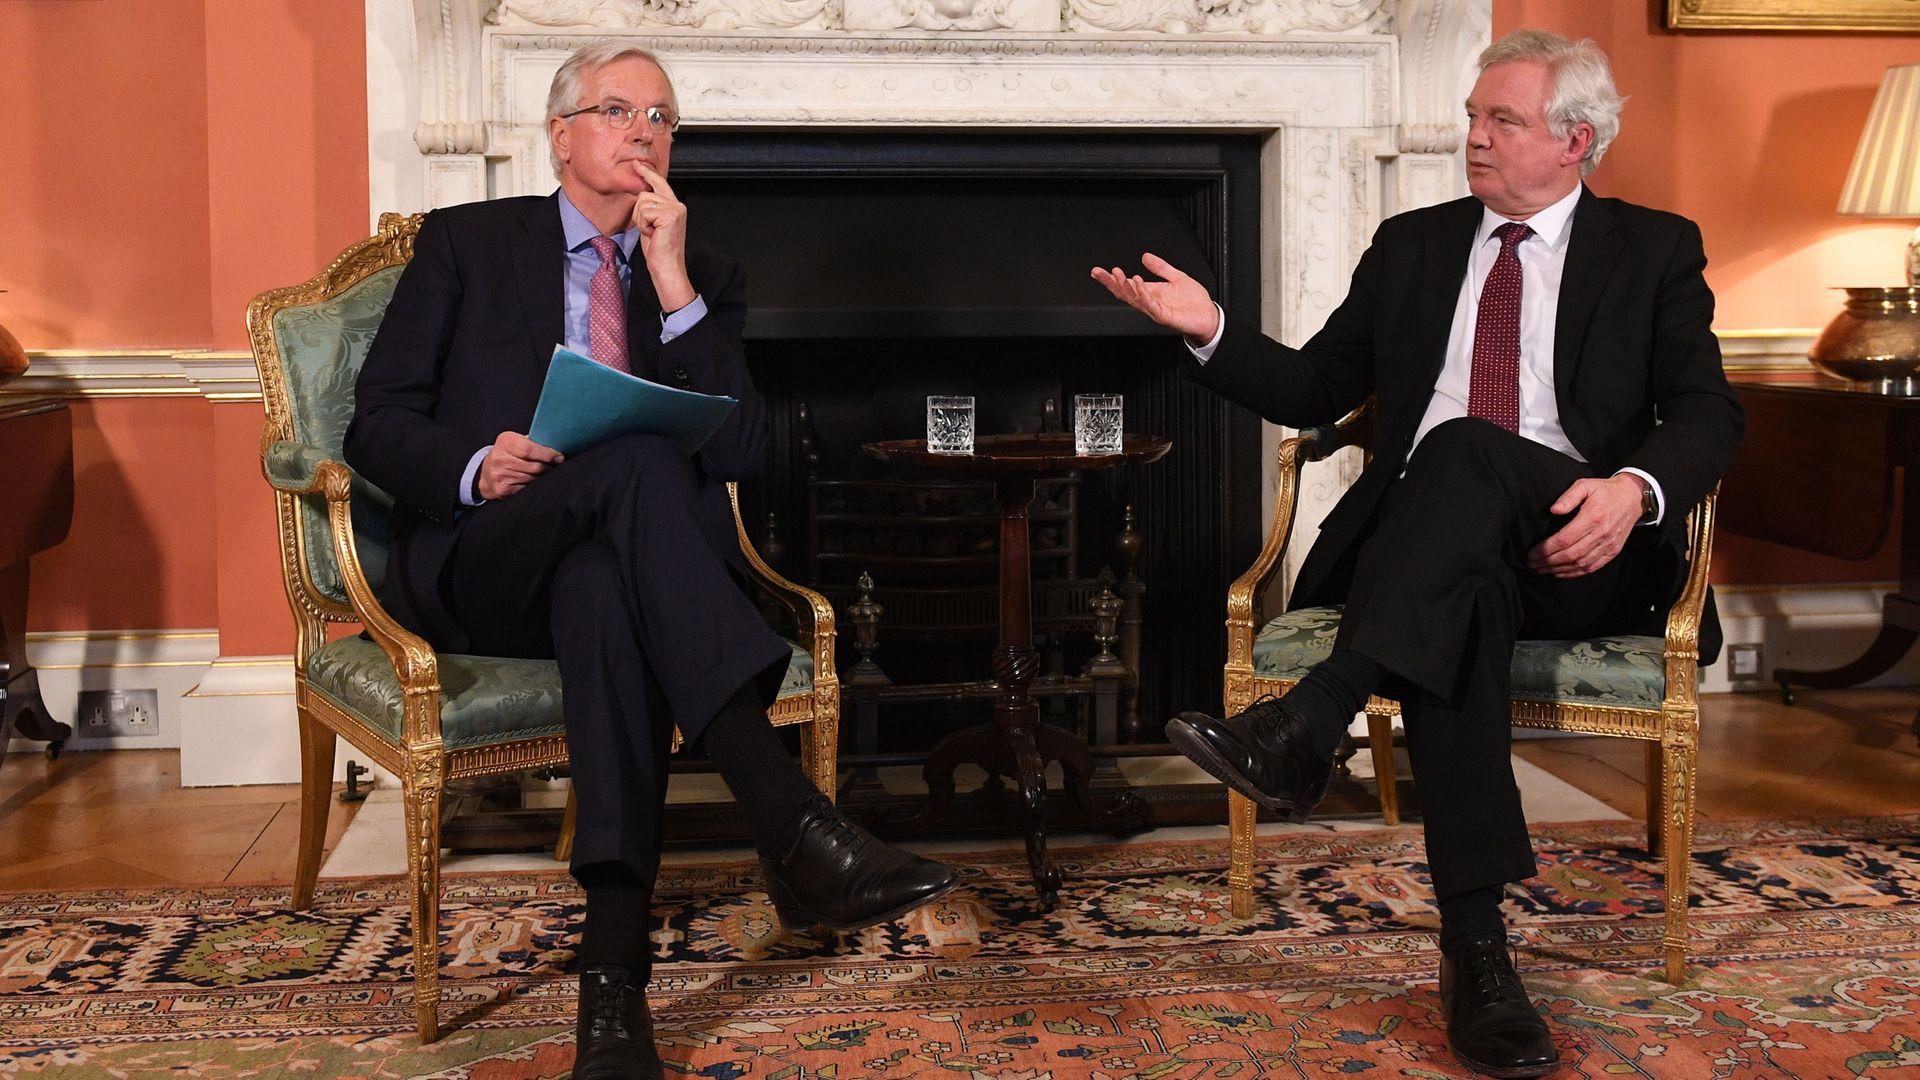 European Commission negotiator Michel Barnier meets with former Brexit secretary David Davis - Credit: PA